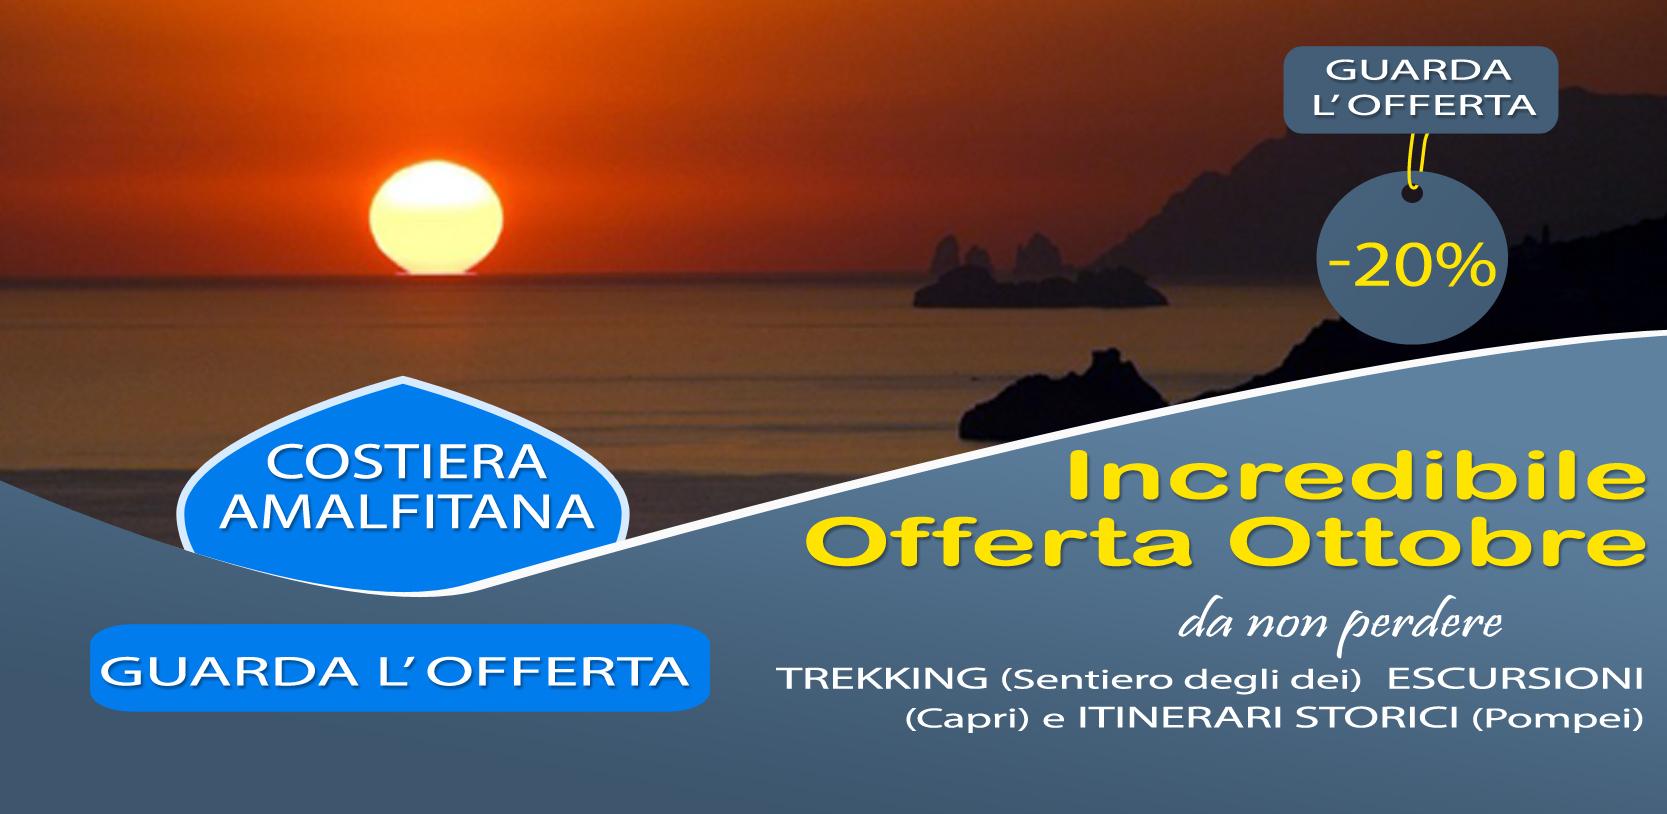 offerta-bb-costiera-amalfitana1